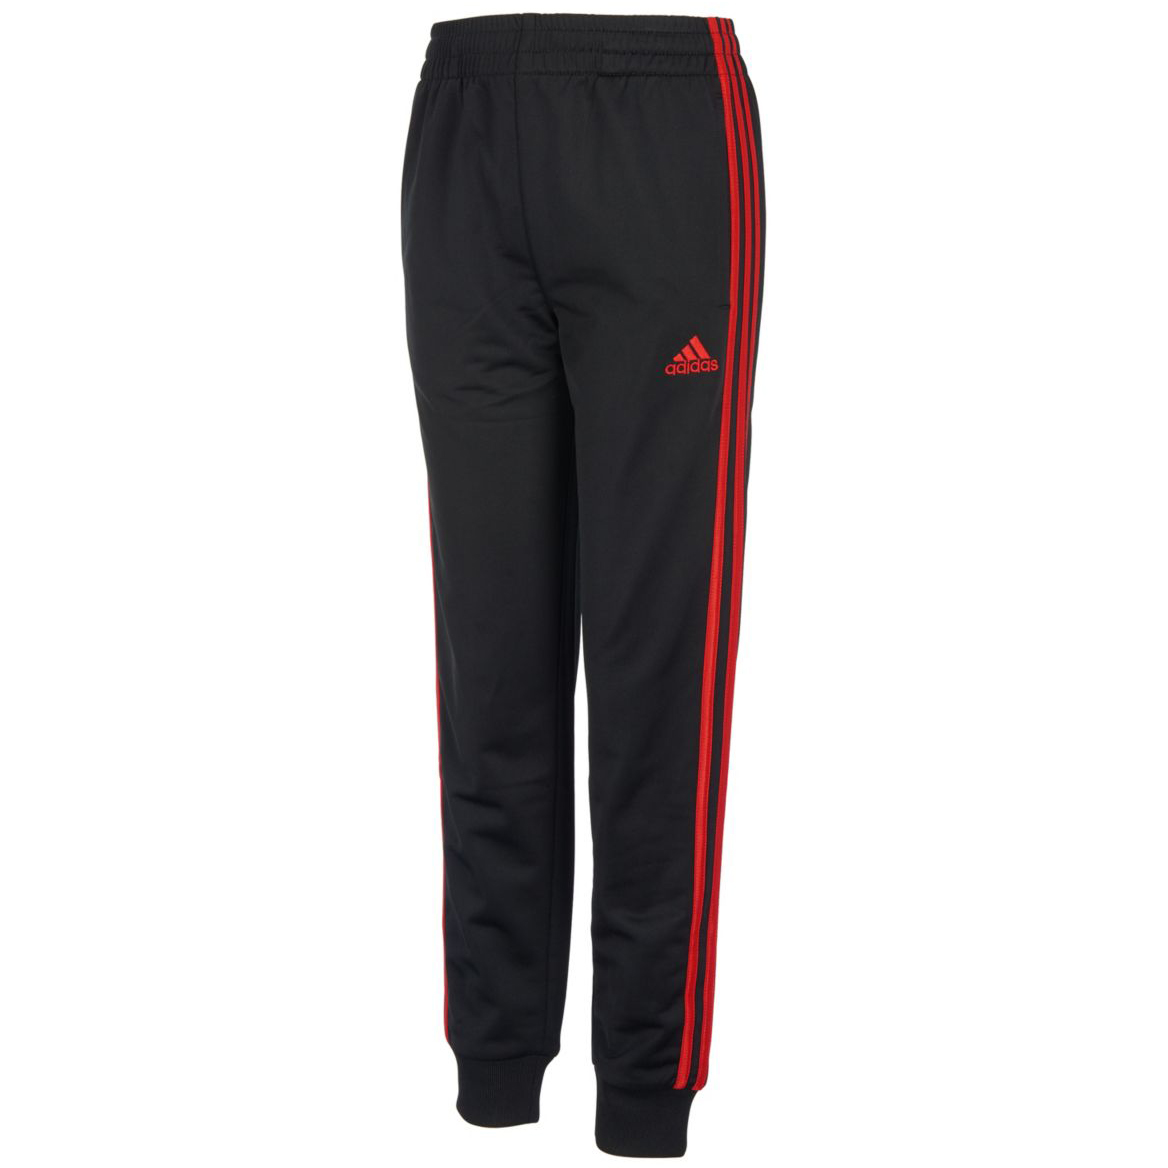 Adidas Little Boys' Impact Tricot Jogger Pants - Black, 5